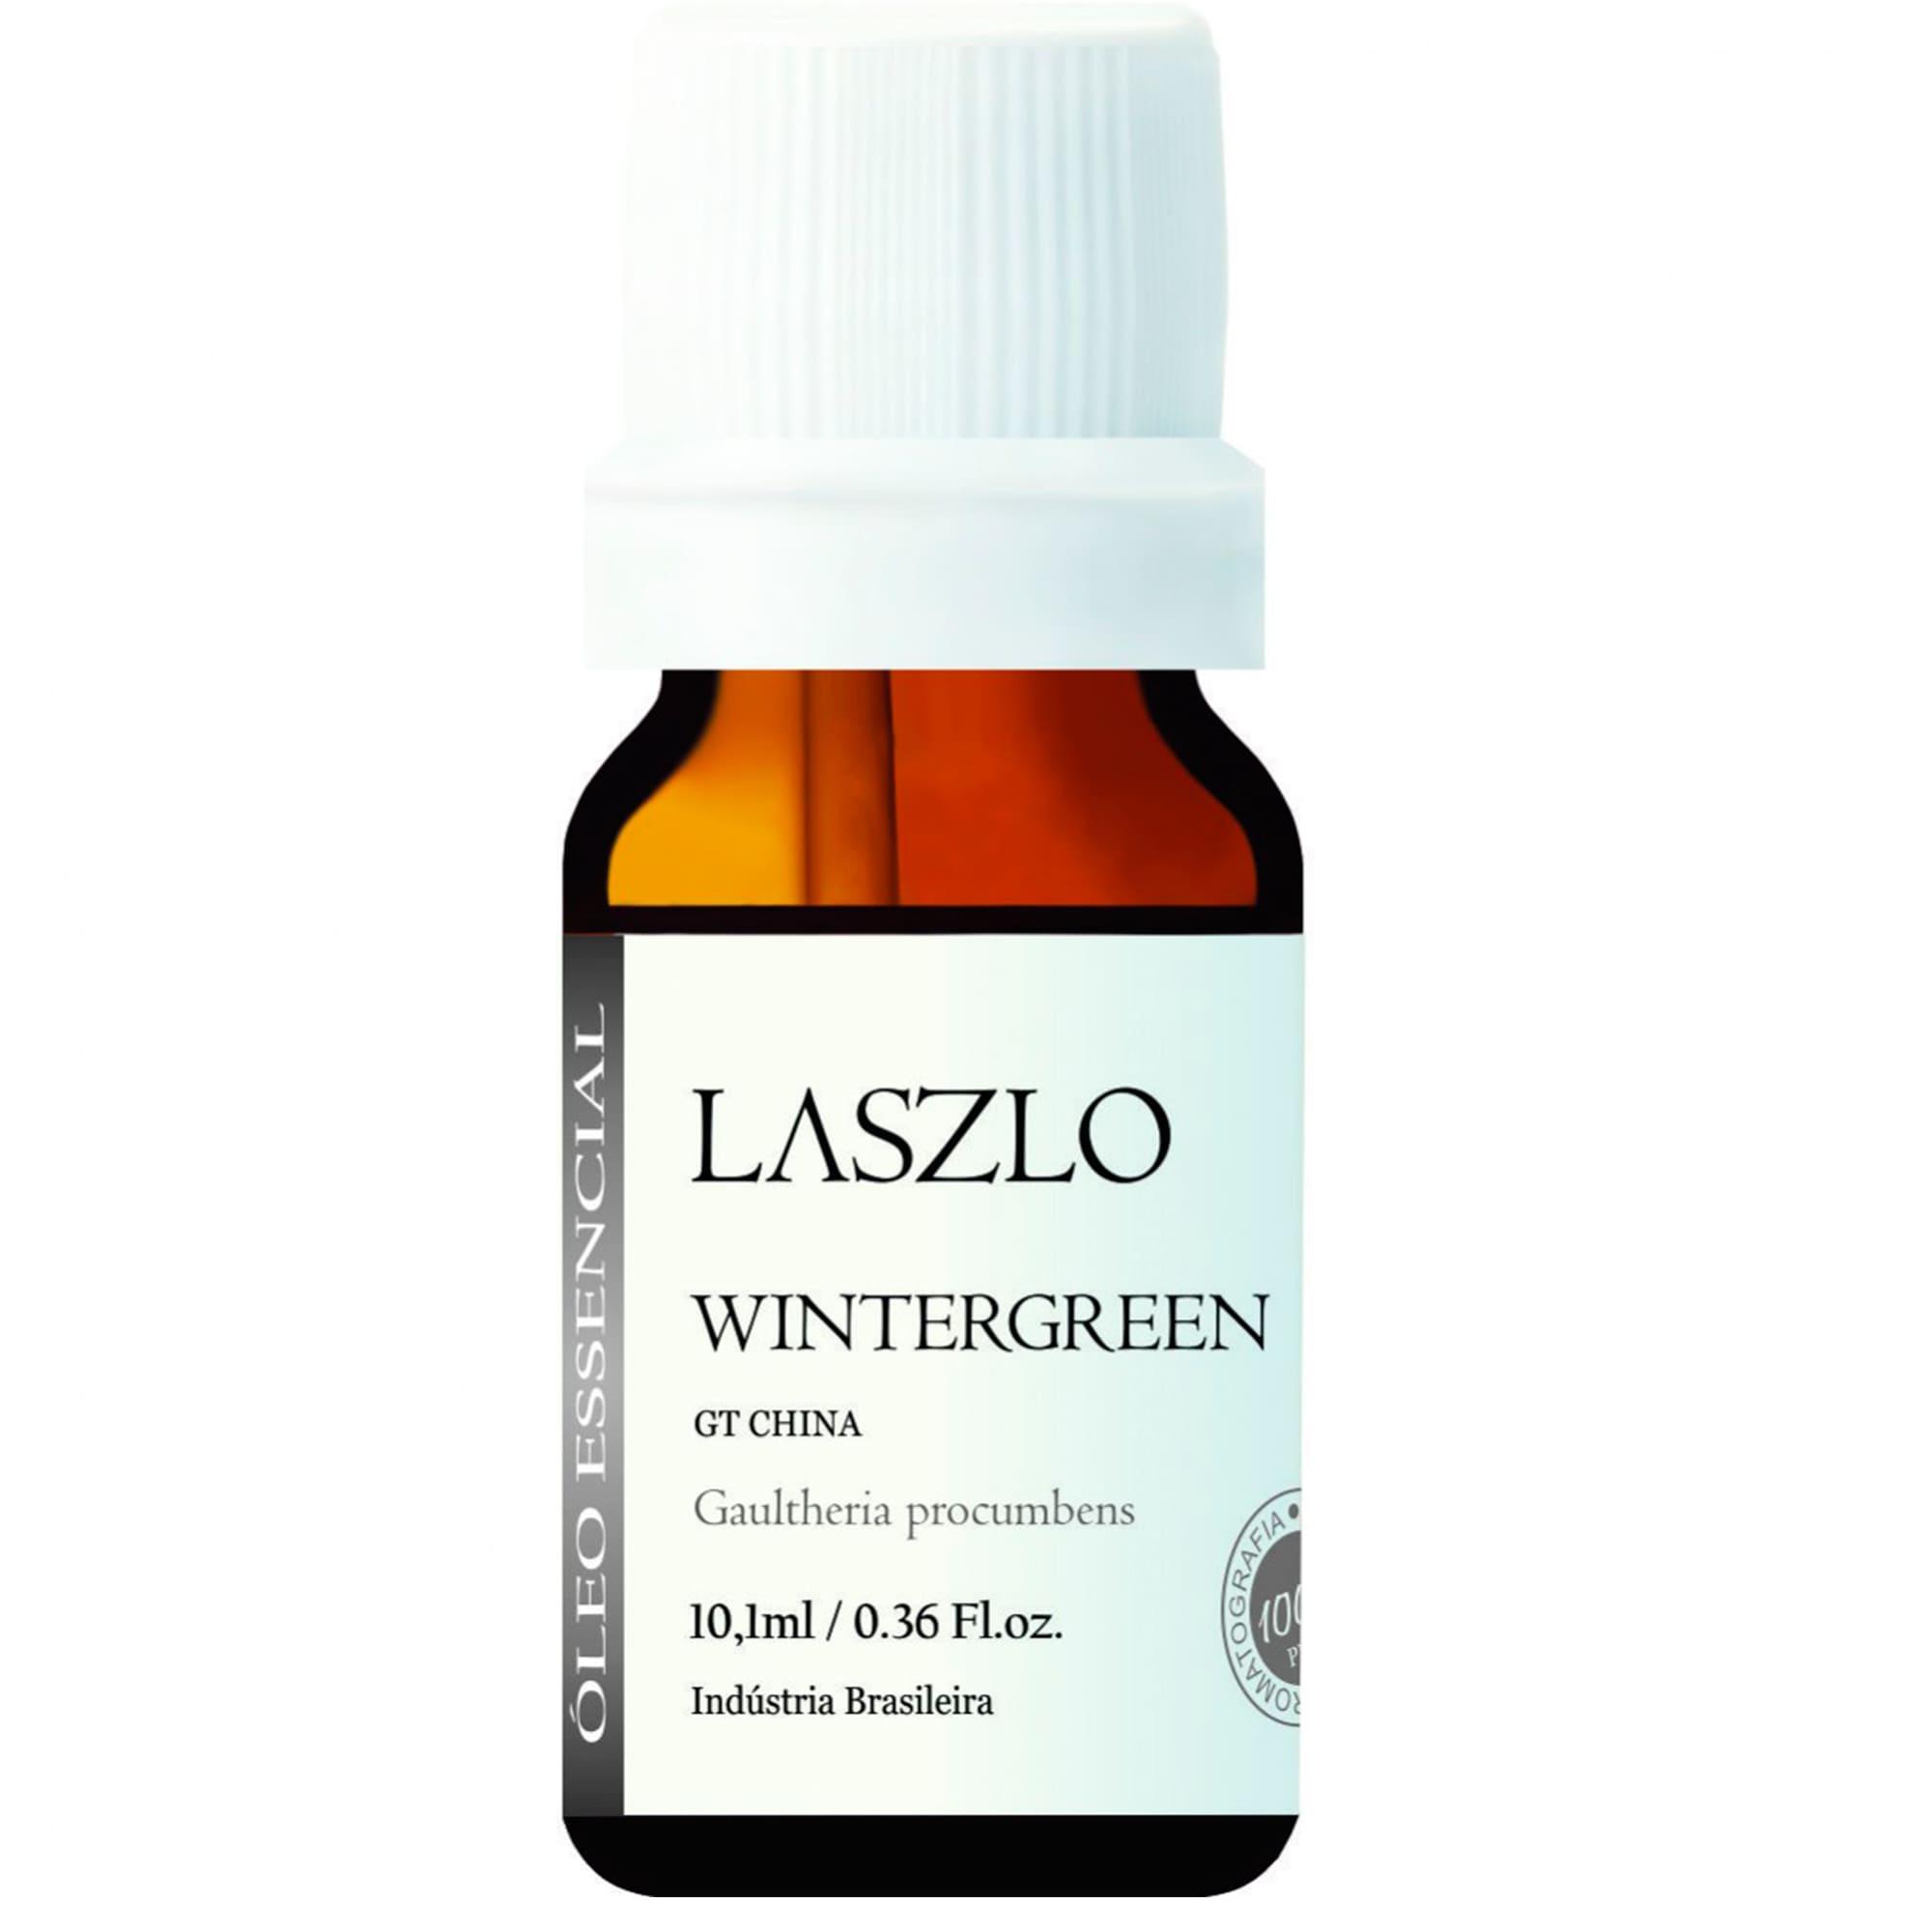 Óleo Essencial de Wintergreen 10,1ml - Laszlo